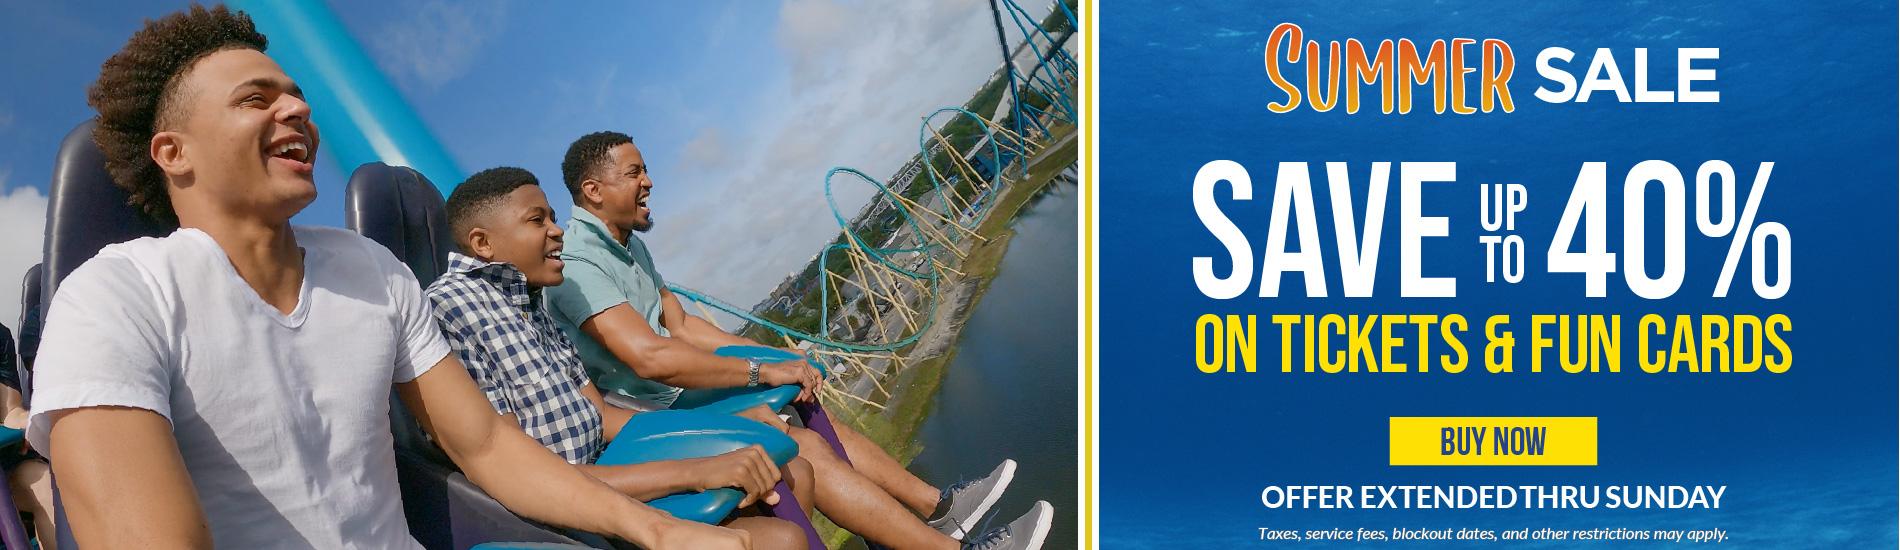 SeaWorld Orlando Summer Sale